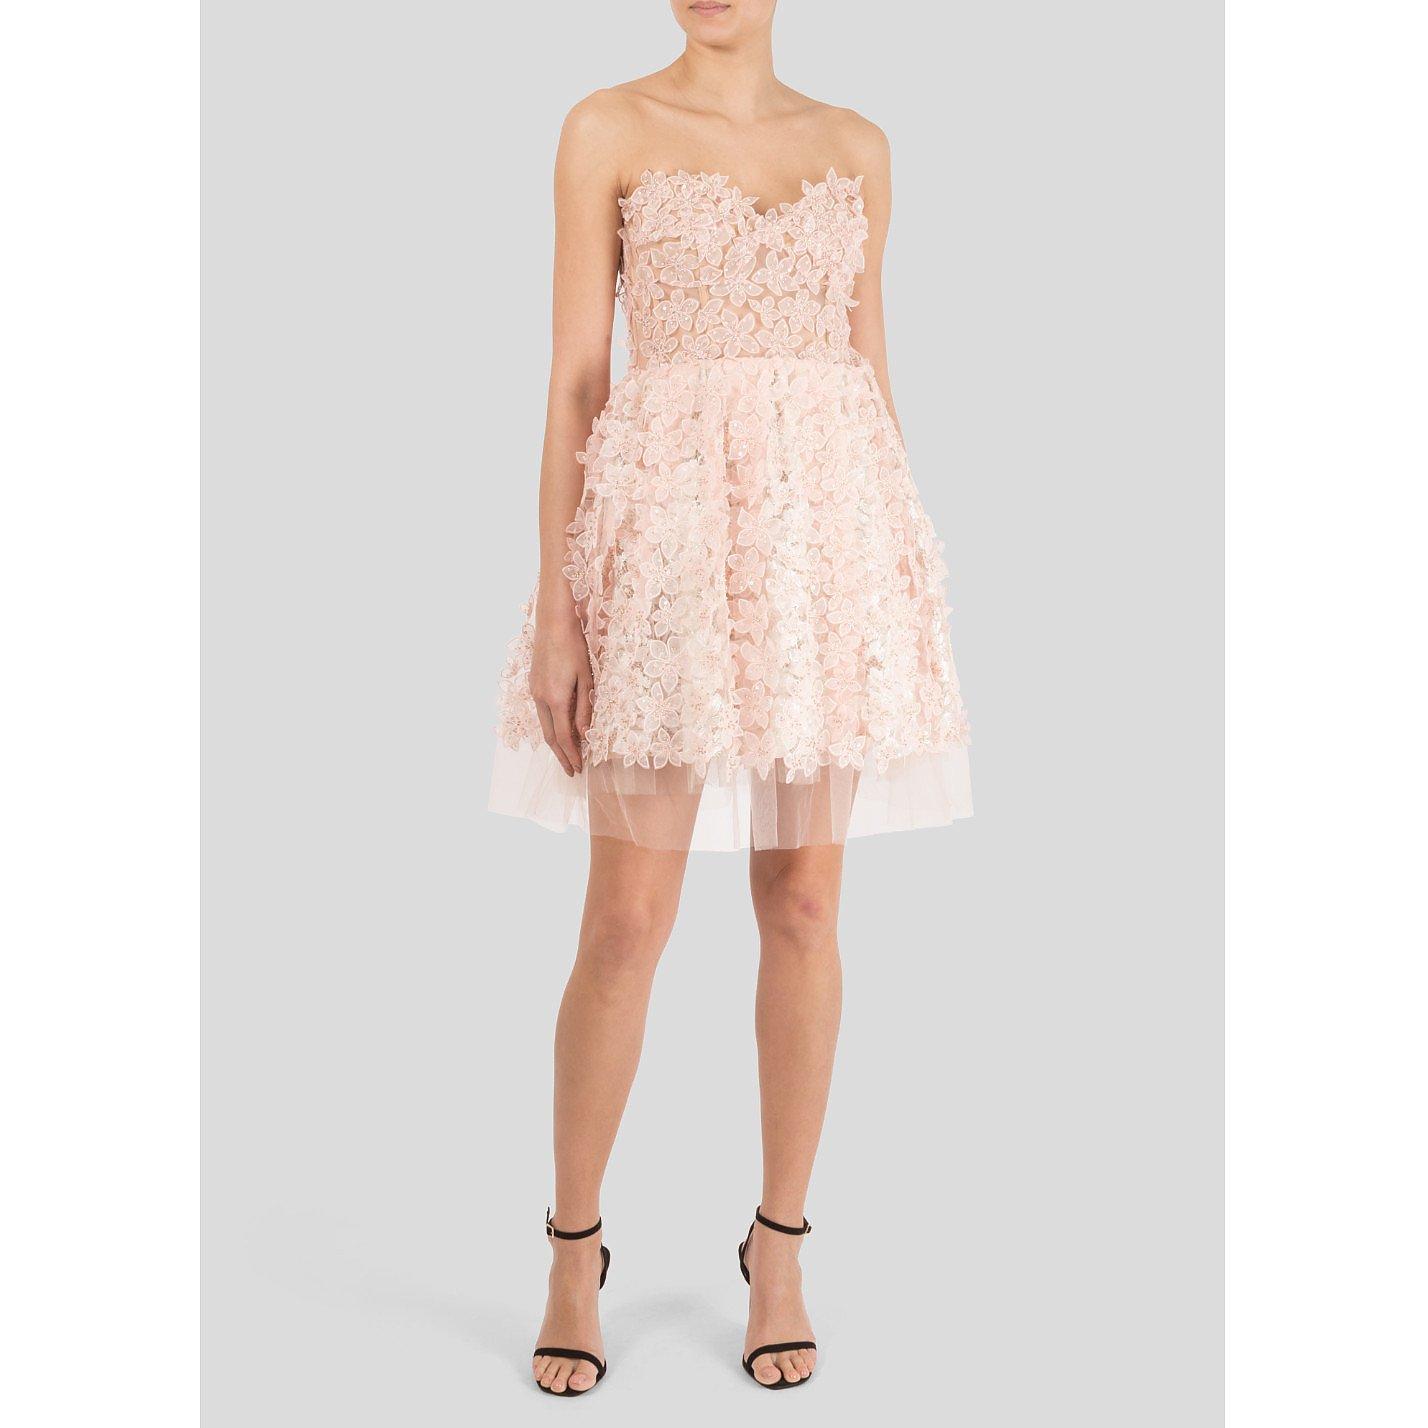 Giambattista Valli x H&M Embellished Tulle Dress